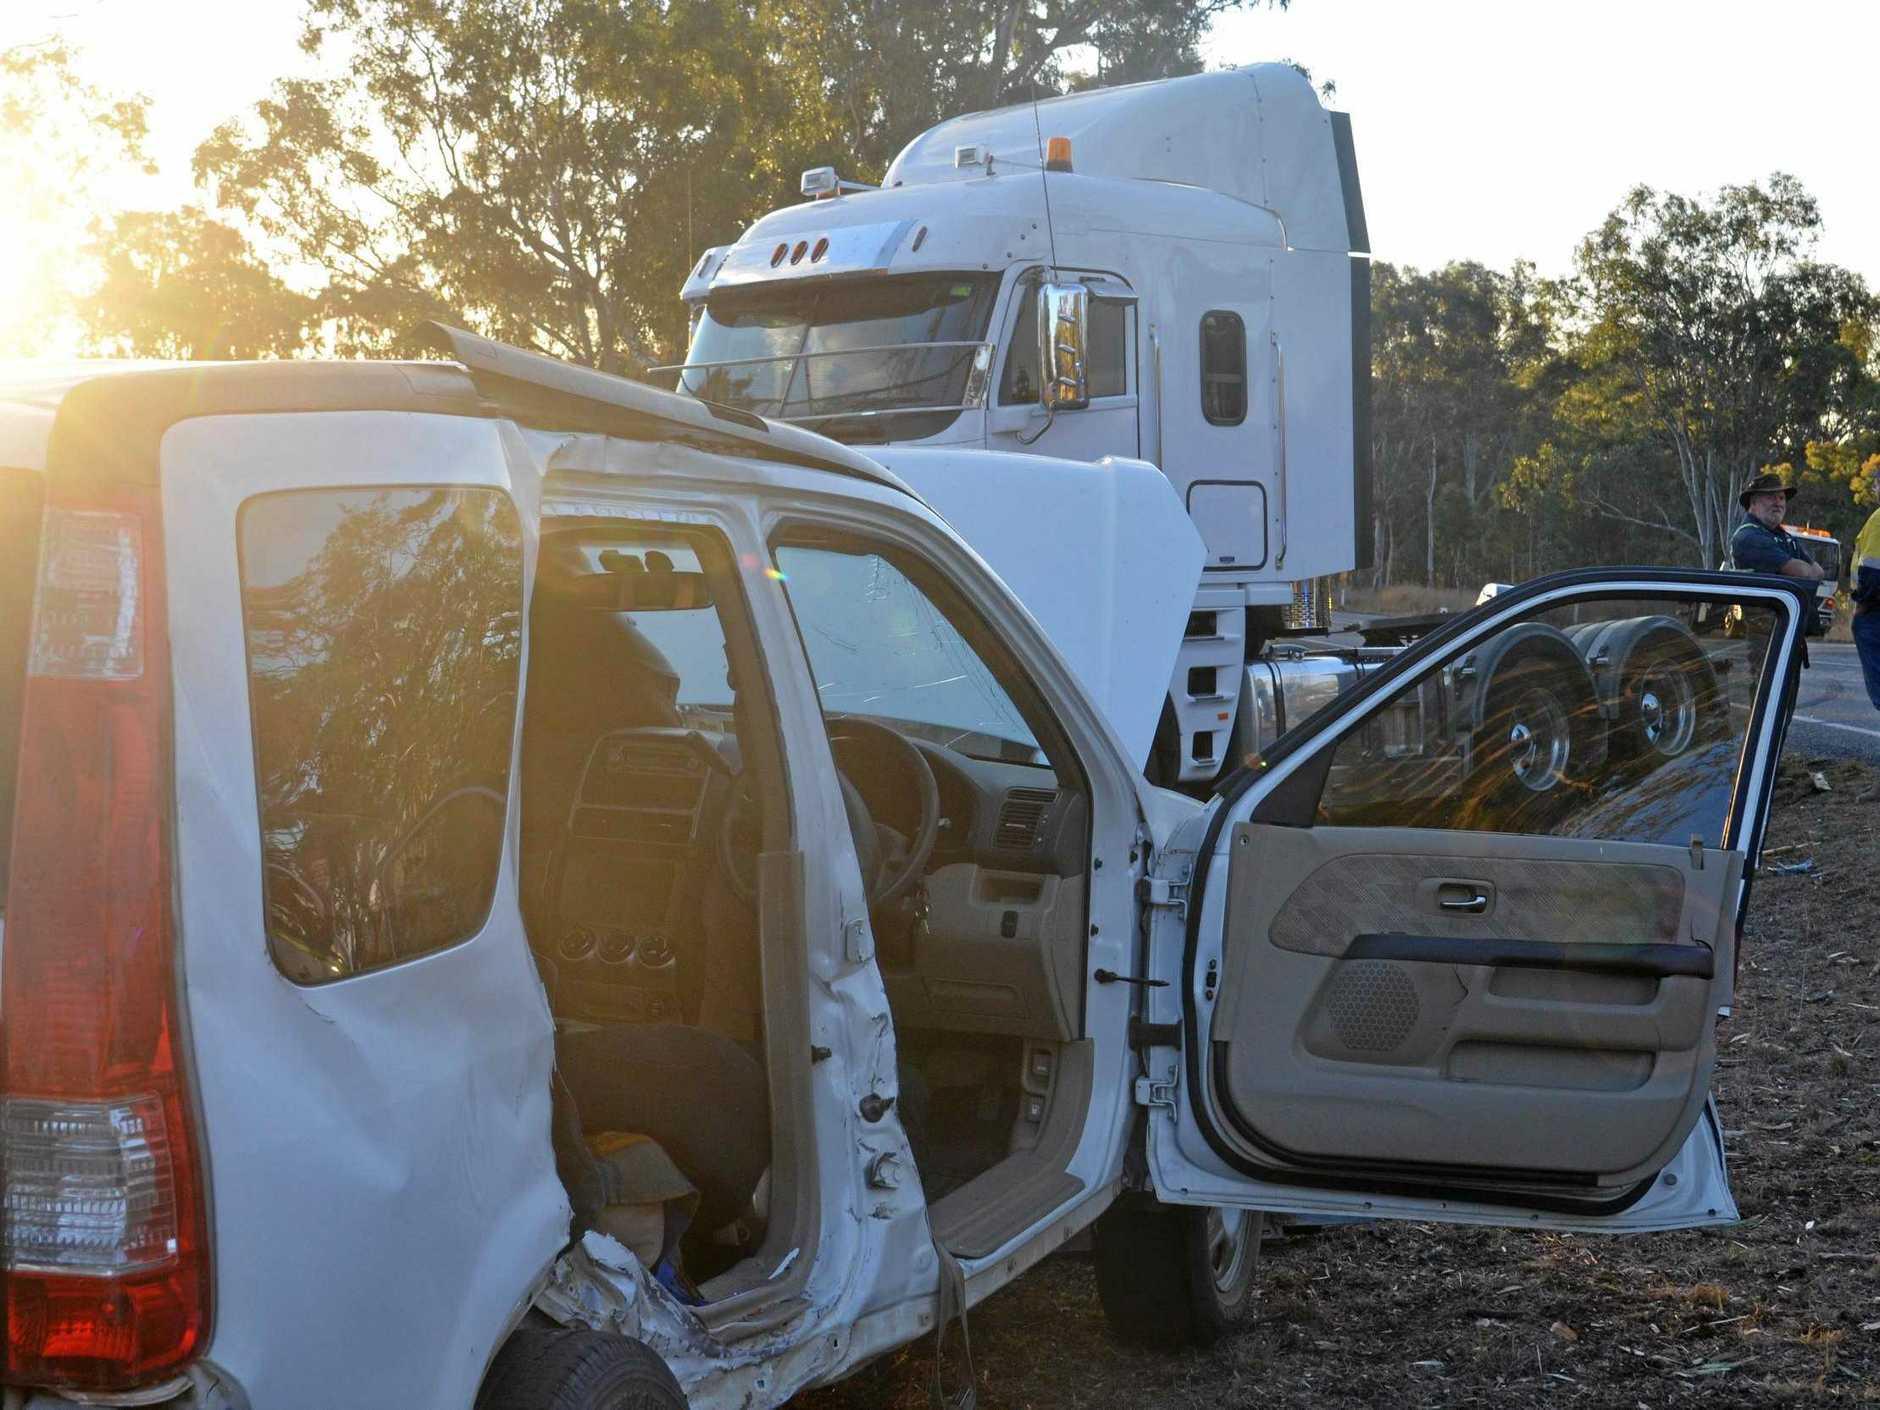 TRAFFIC COLLISION: The crash left three elderly people injured.